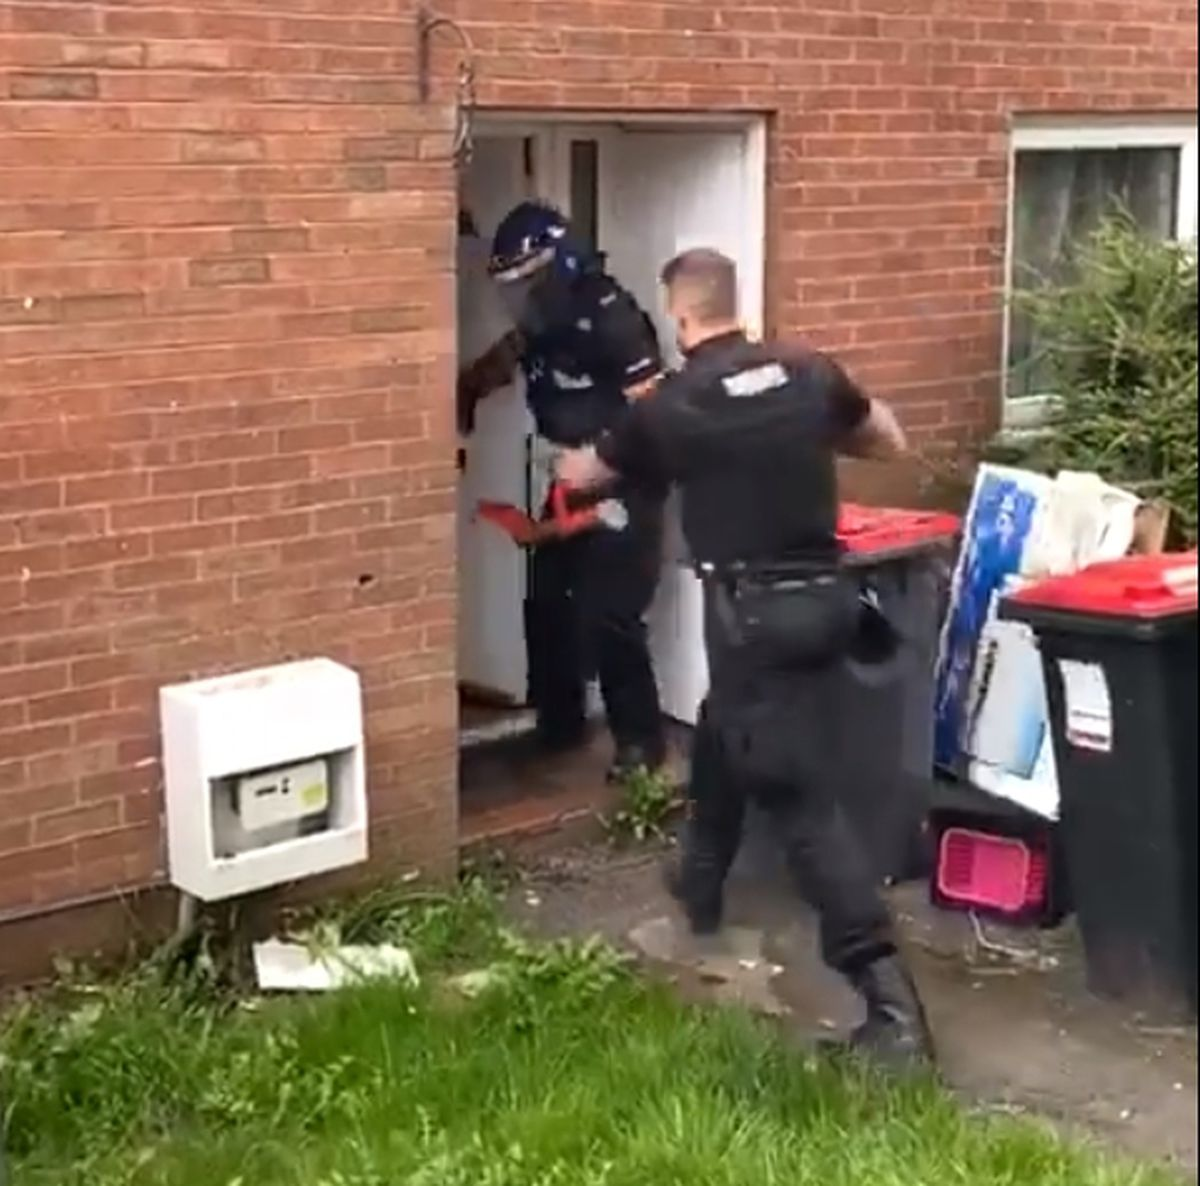 Police smash their way in through the front door